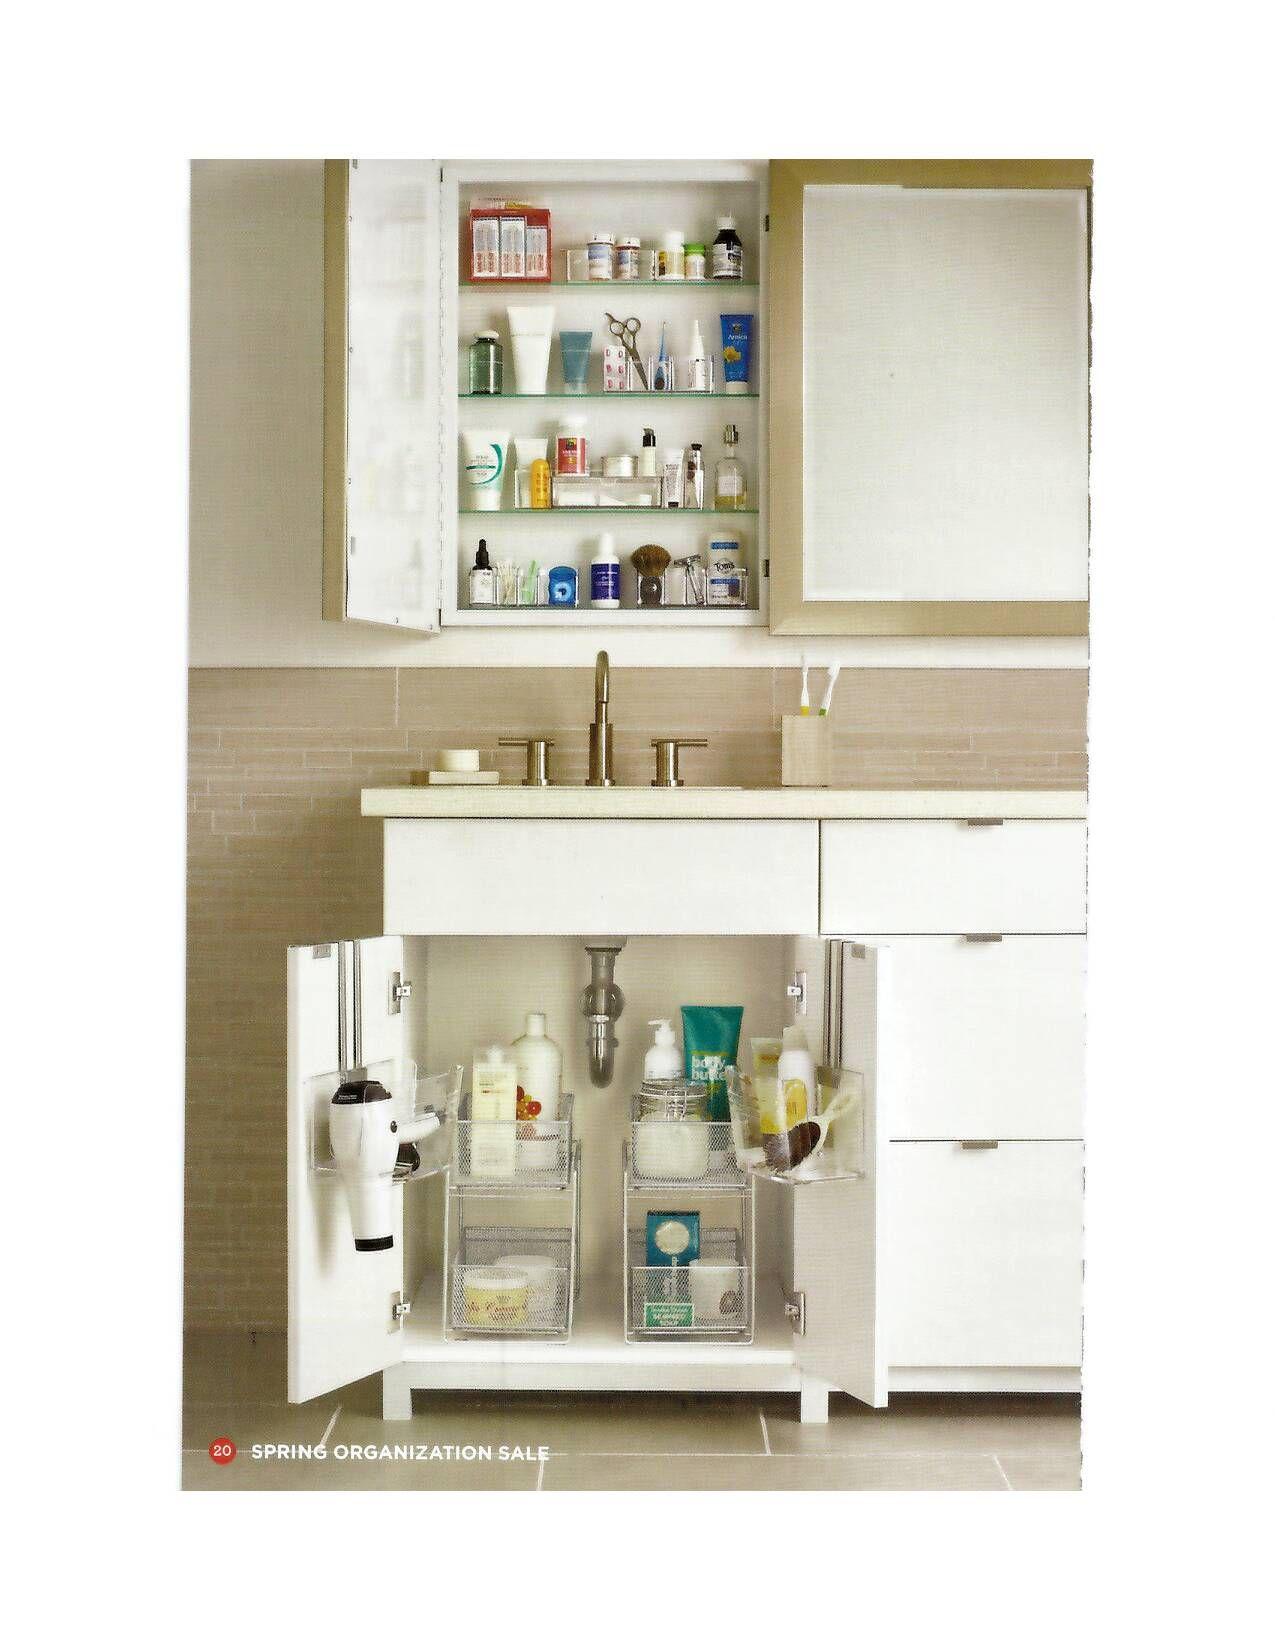 Bathroom organization for the home pinterest for Bathroom organization ideas pinterest